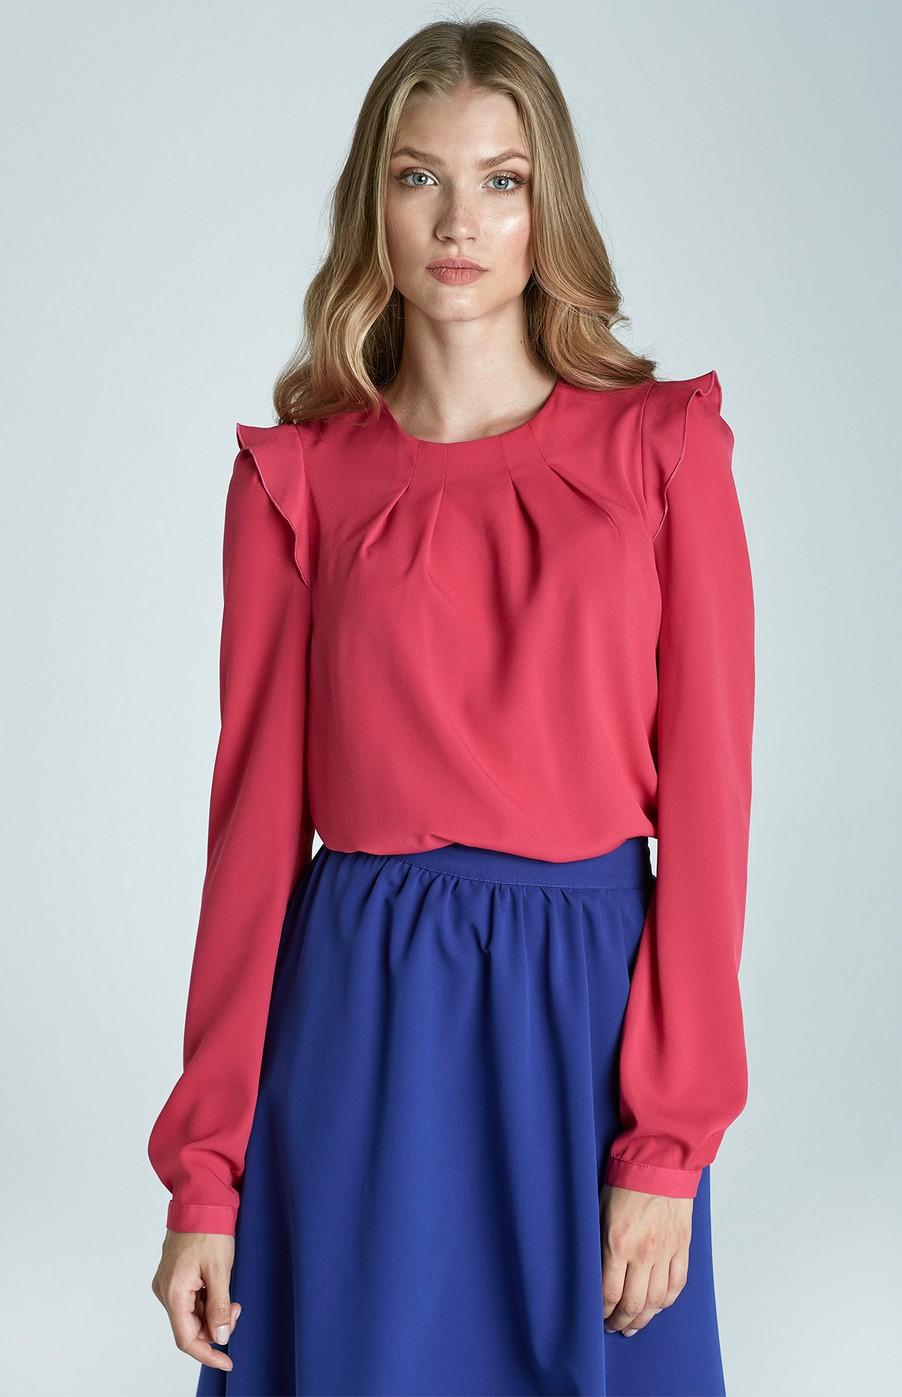 Pink Romantic Blouse Nib60r Idresstocode Online